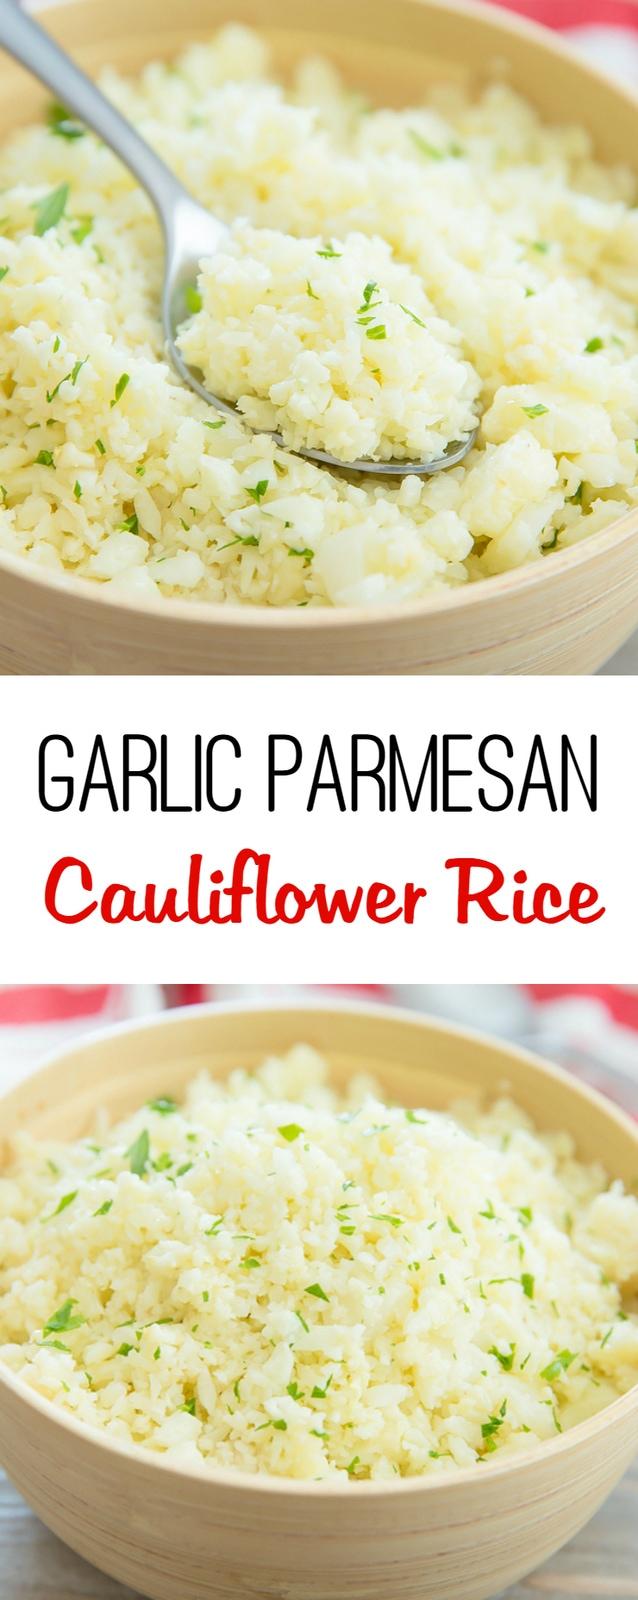 Garlic Parmesan Cauliflower Rice. A flavorful, low carb rice alternative.